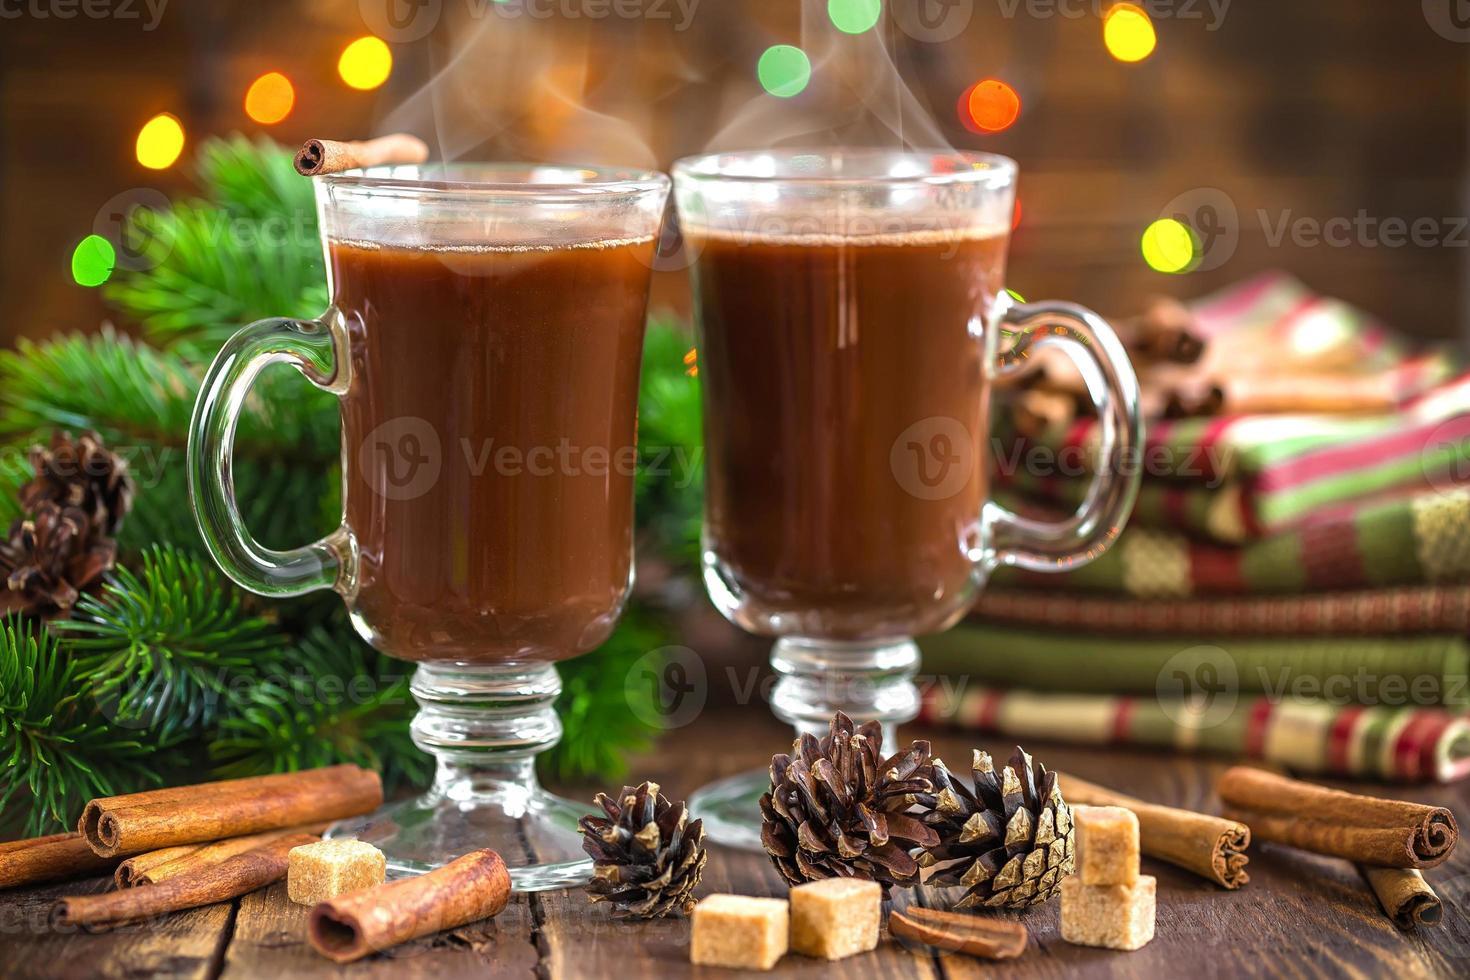 kerst cacaodrank foto